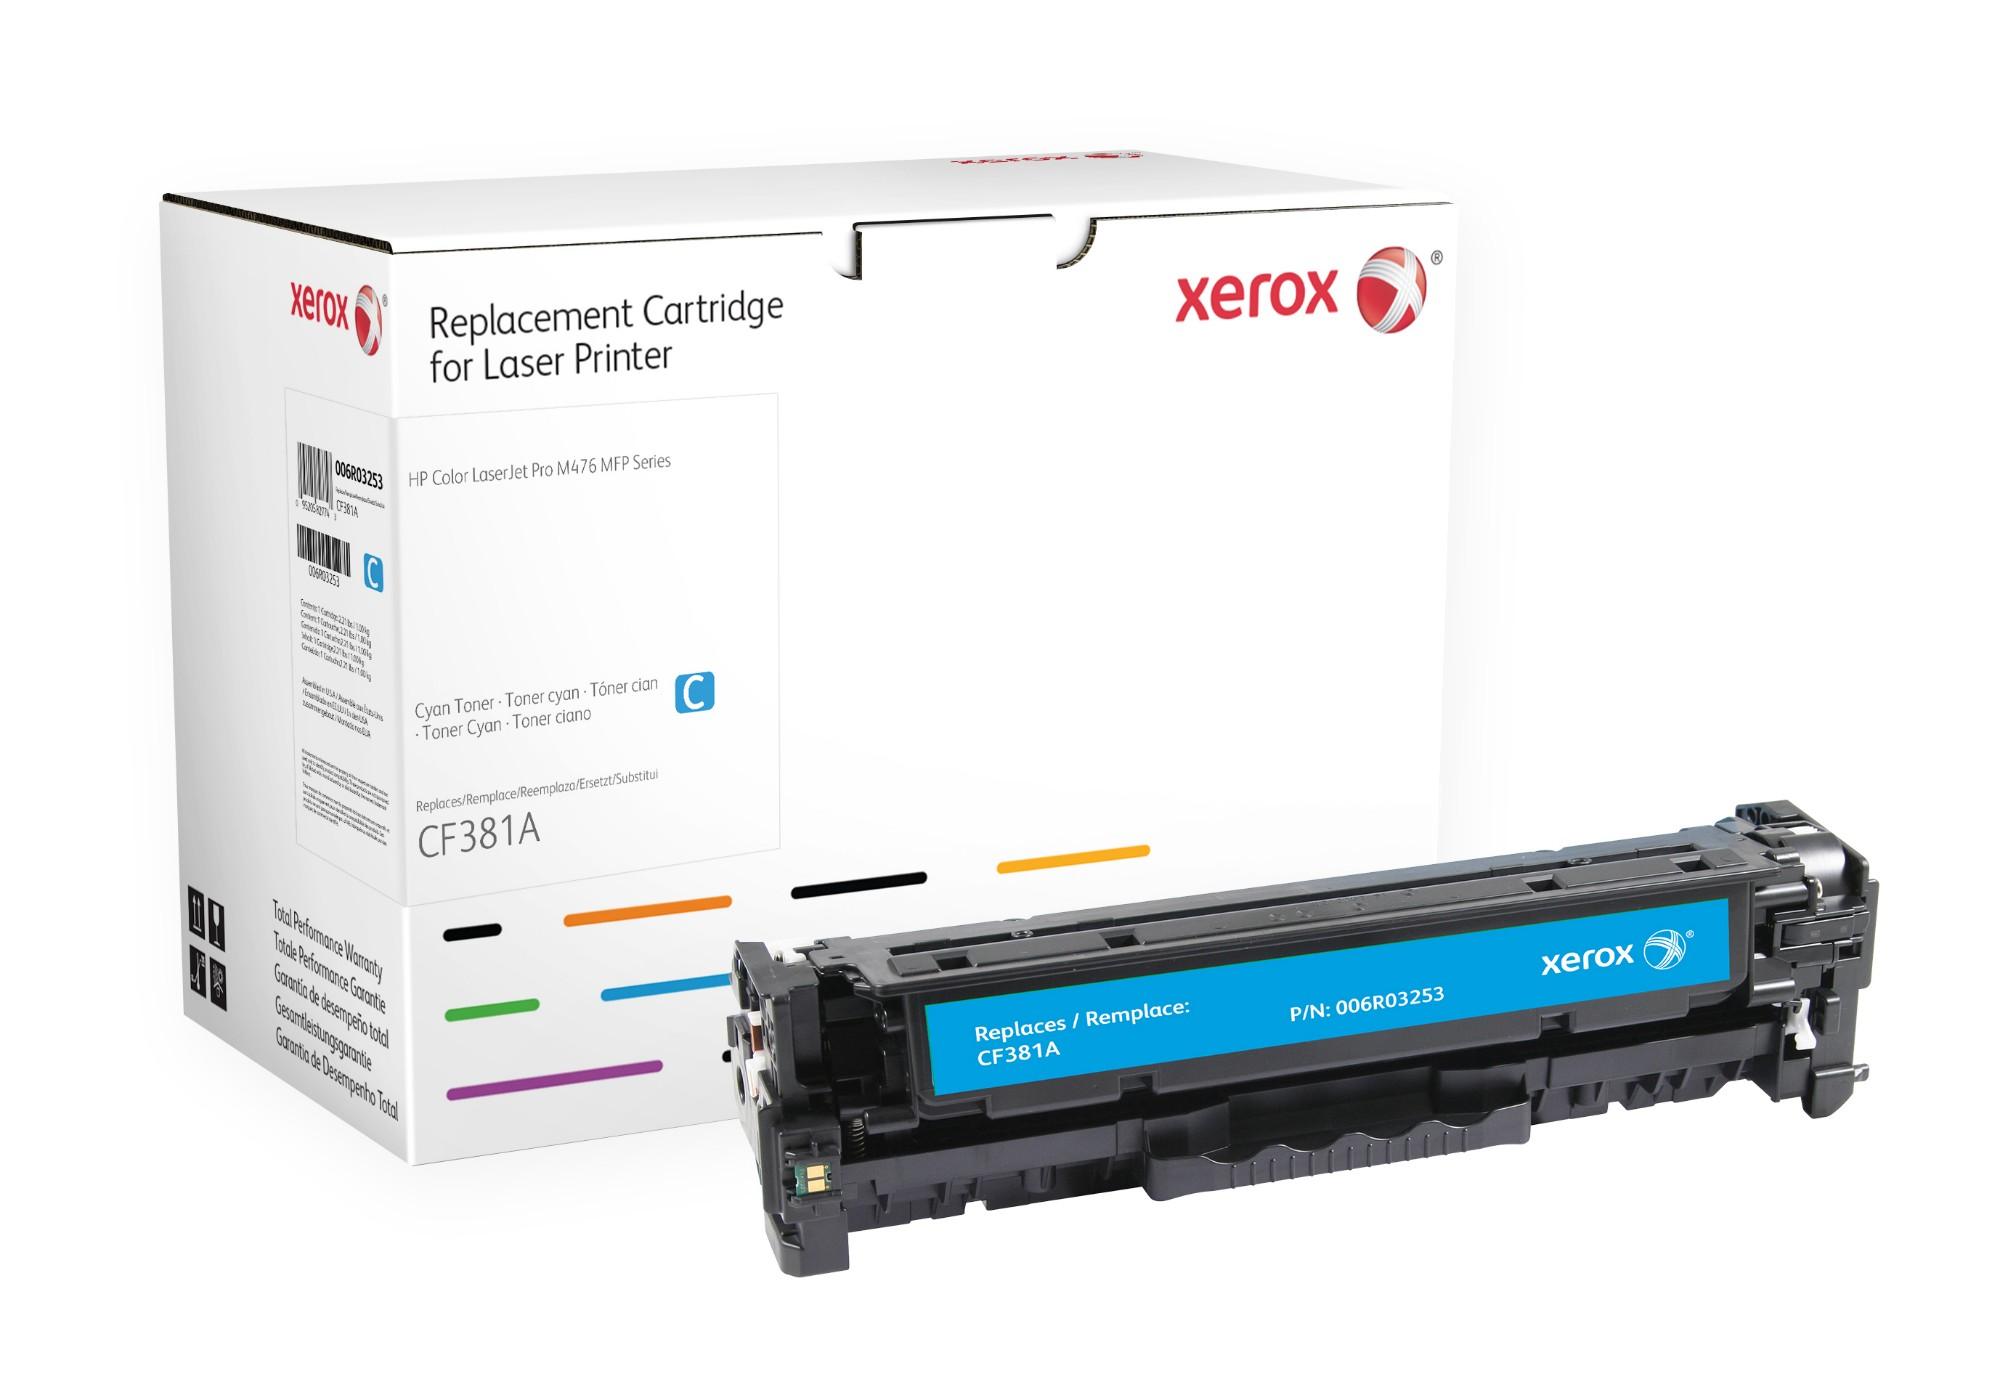 Xerox Cartucho de tóner cian. Equivalente a HP CF381A. Compatible con HP Colour LaserJet M476/M476DN/M476DW/M476NW